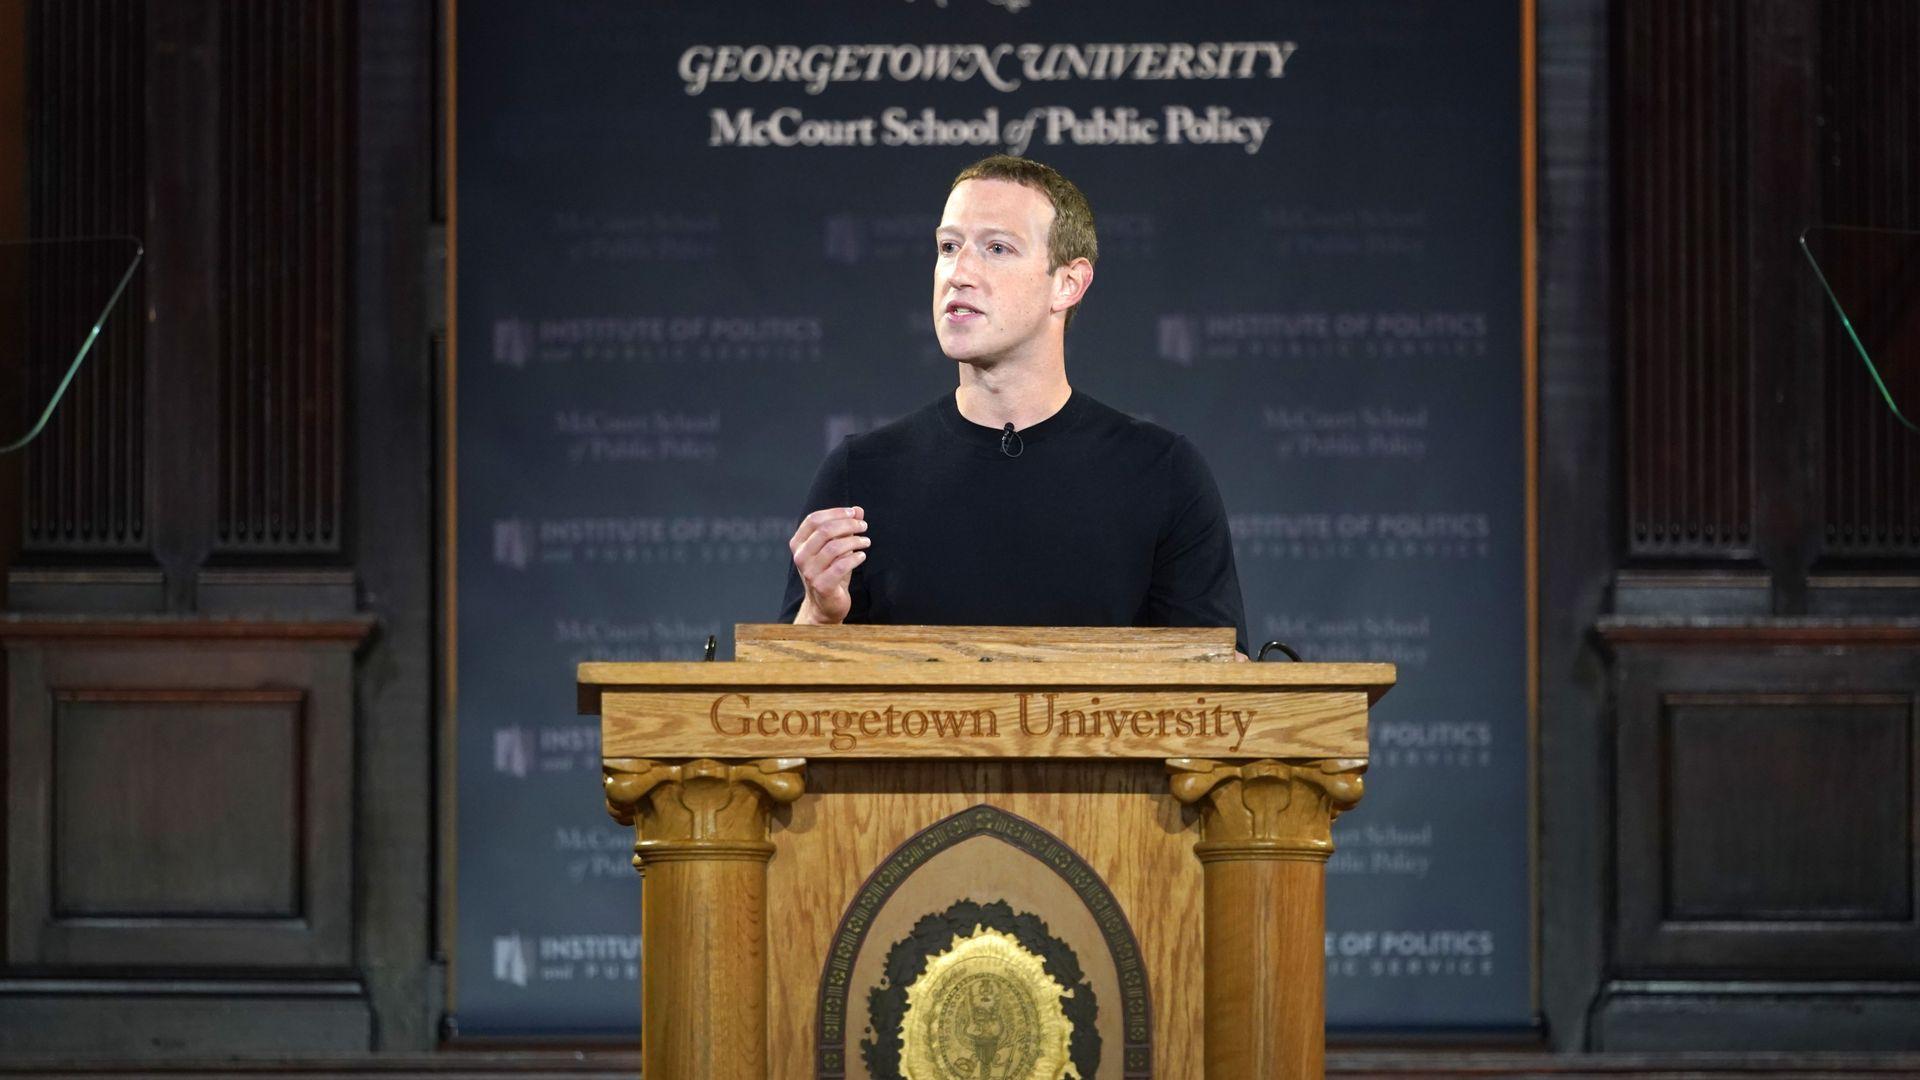 Facebook CEO Mark Zuckerberg, speaking at Georgetown University on Thursday.